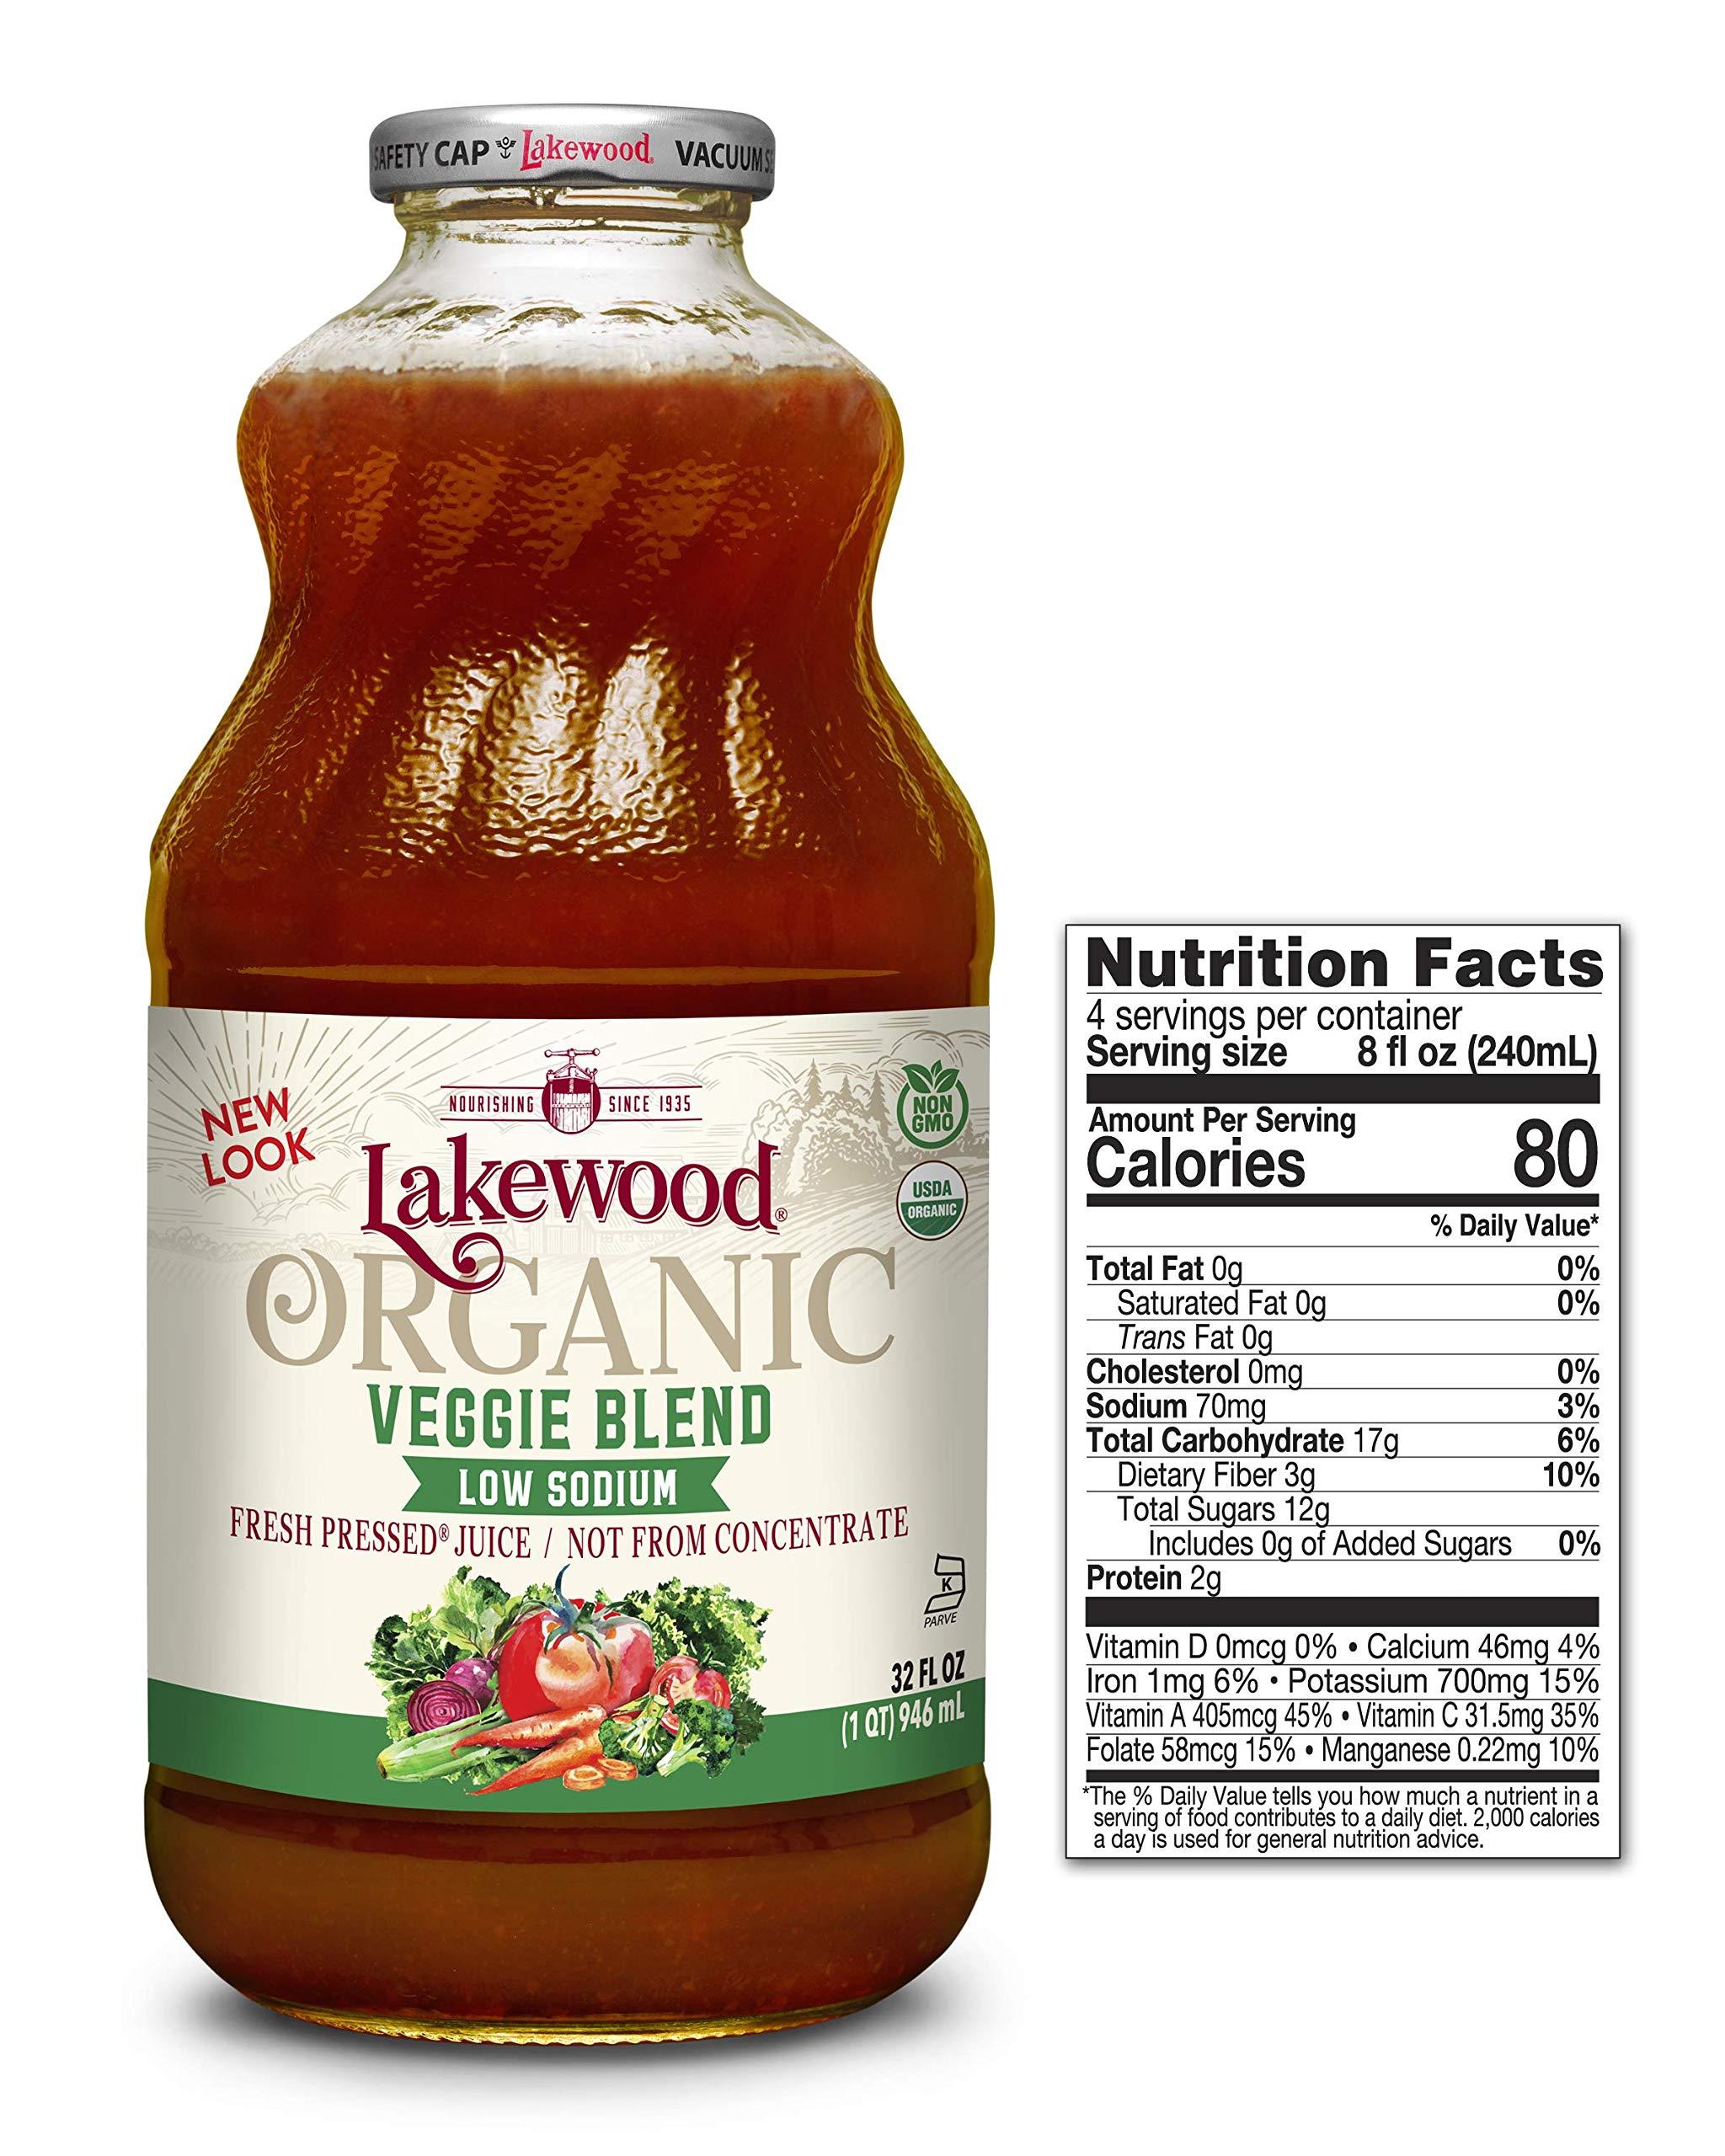 Lakewood Organic Super Veggie Low Sodium Juice, 32 Ounce (Pack of 6) by Lakewood